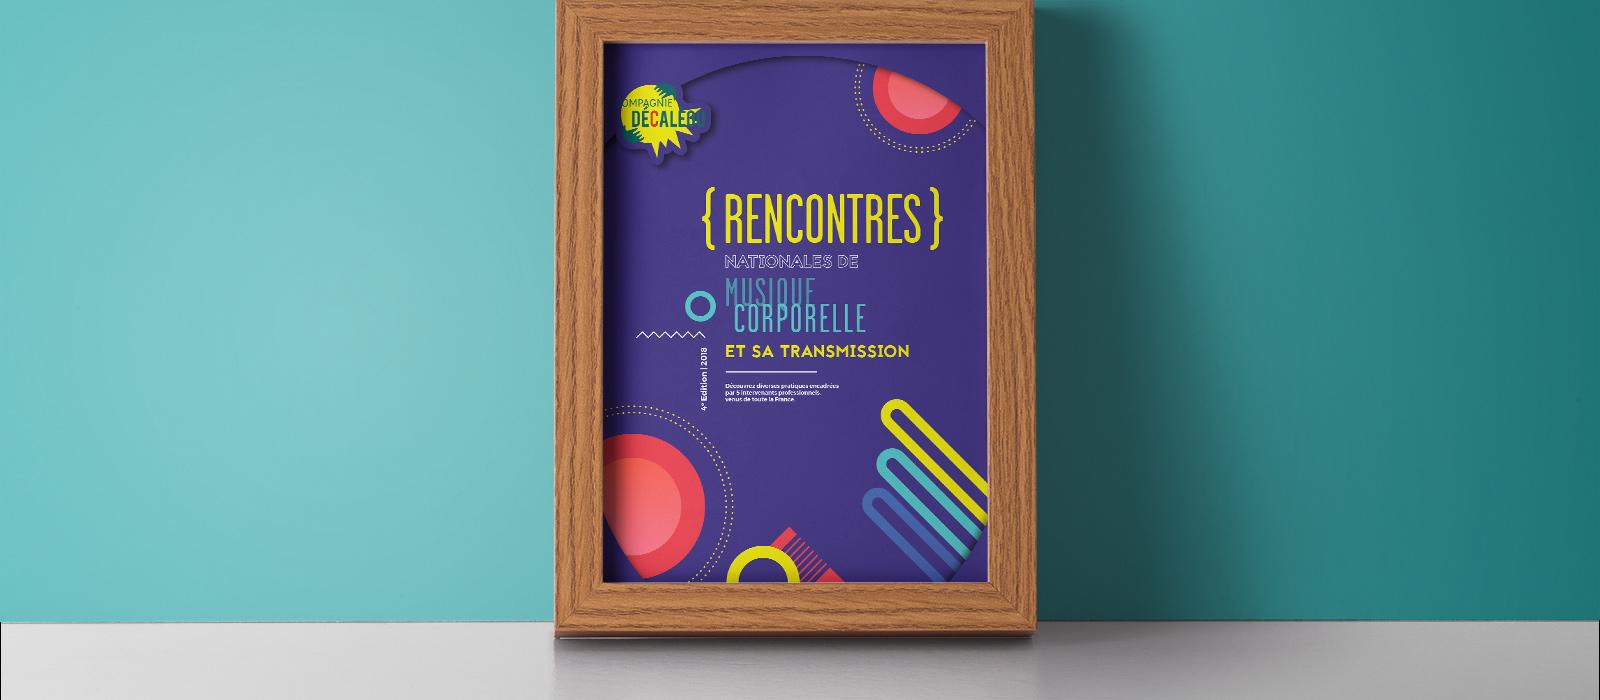 rencontres-musique-corporelle-poster